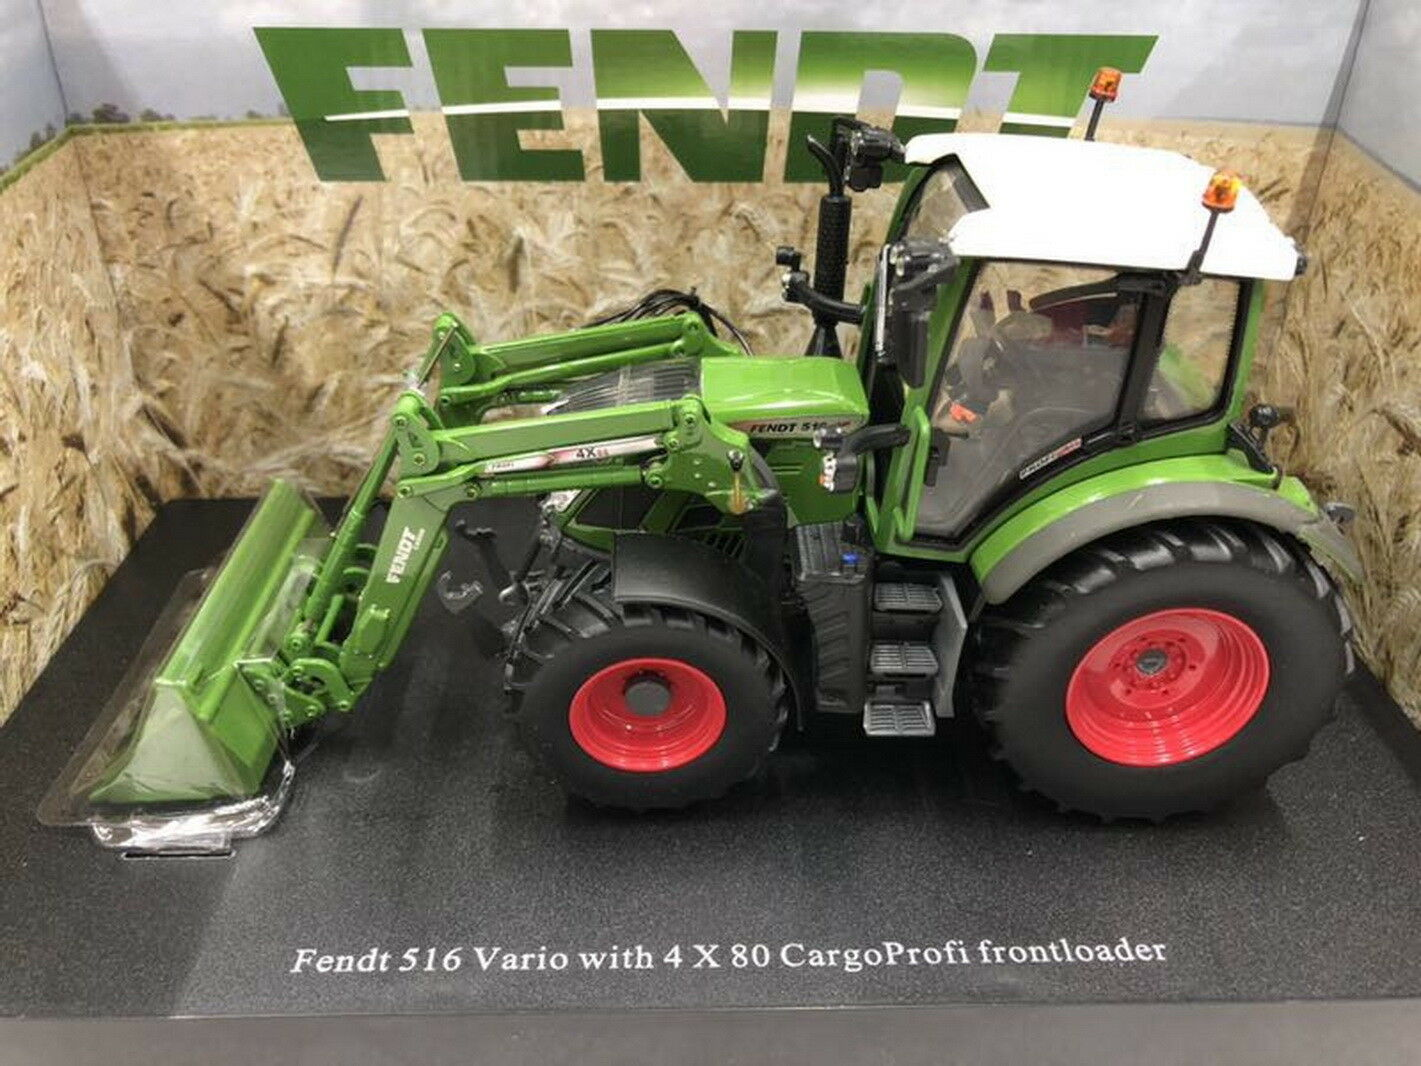 Universal hobbies 1 32 Fendt 516 Vario with CargoProfi loader Diecast UH4981